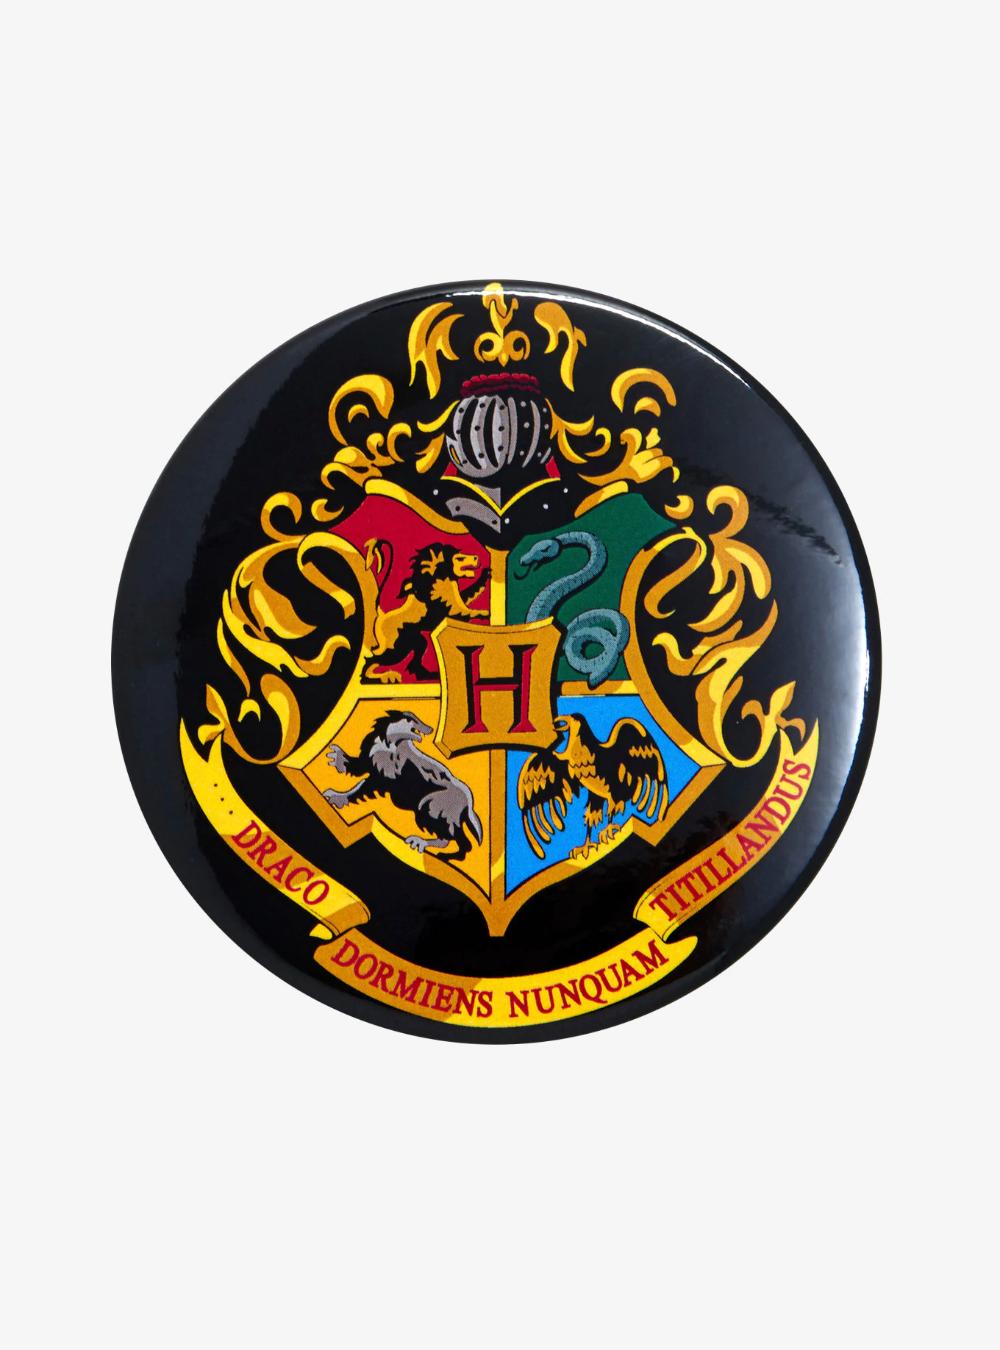 Harry Potter Hogwarts Crest Button Hogwarts Crest Hogwarts Harry Potter Hogwarts